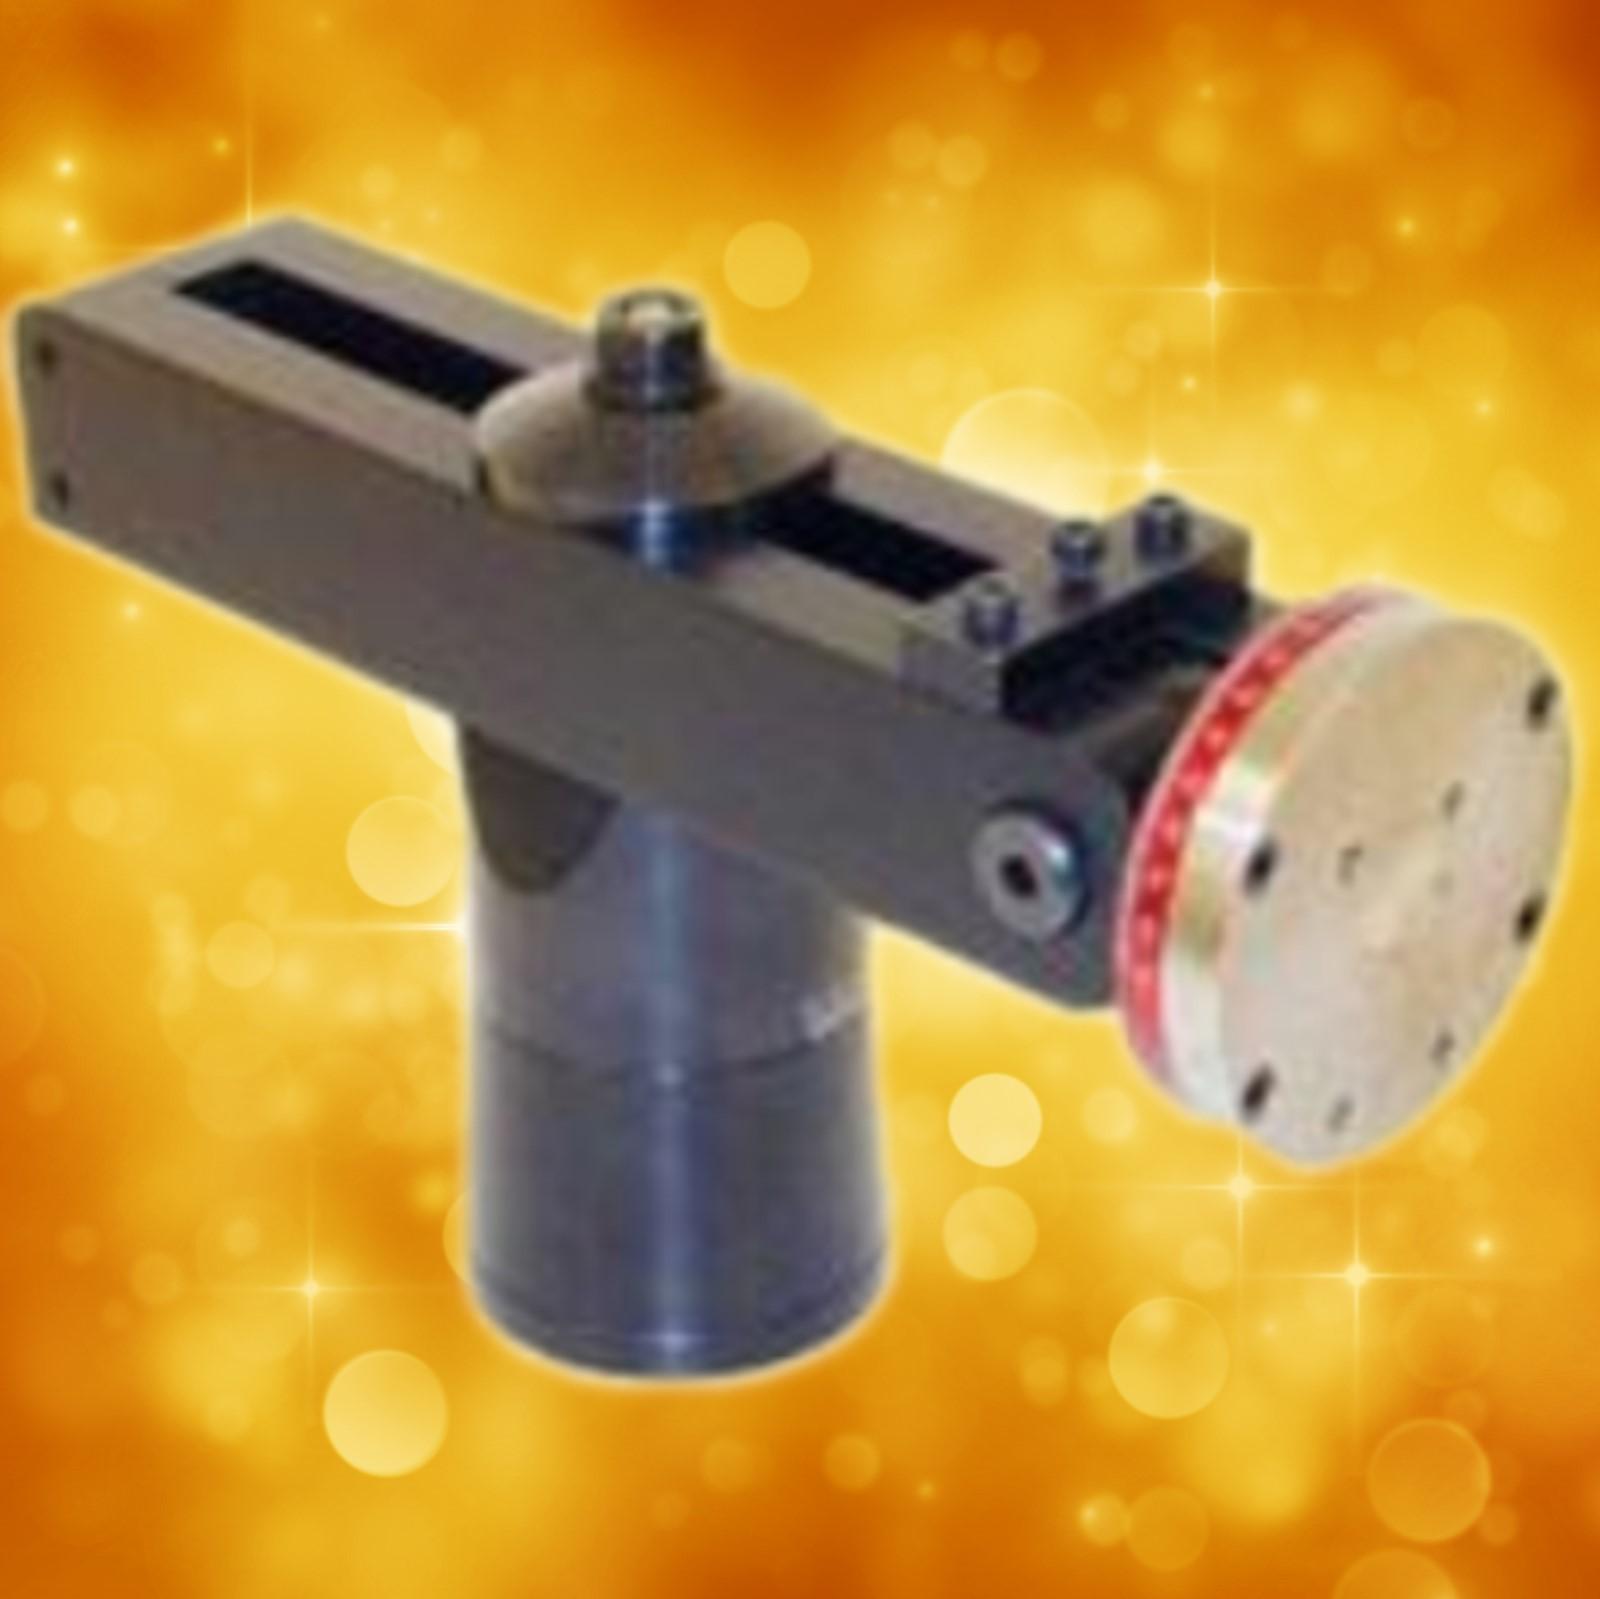 Sherline Upgrade 8-Direction for Lathe Vertical Milling Column (Inch) 5680